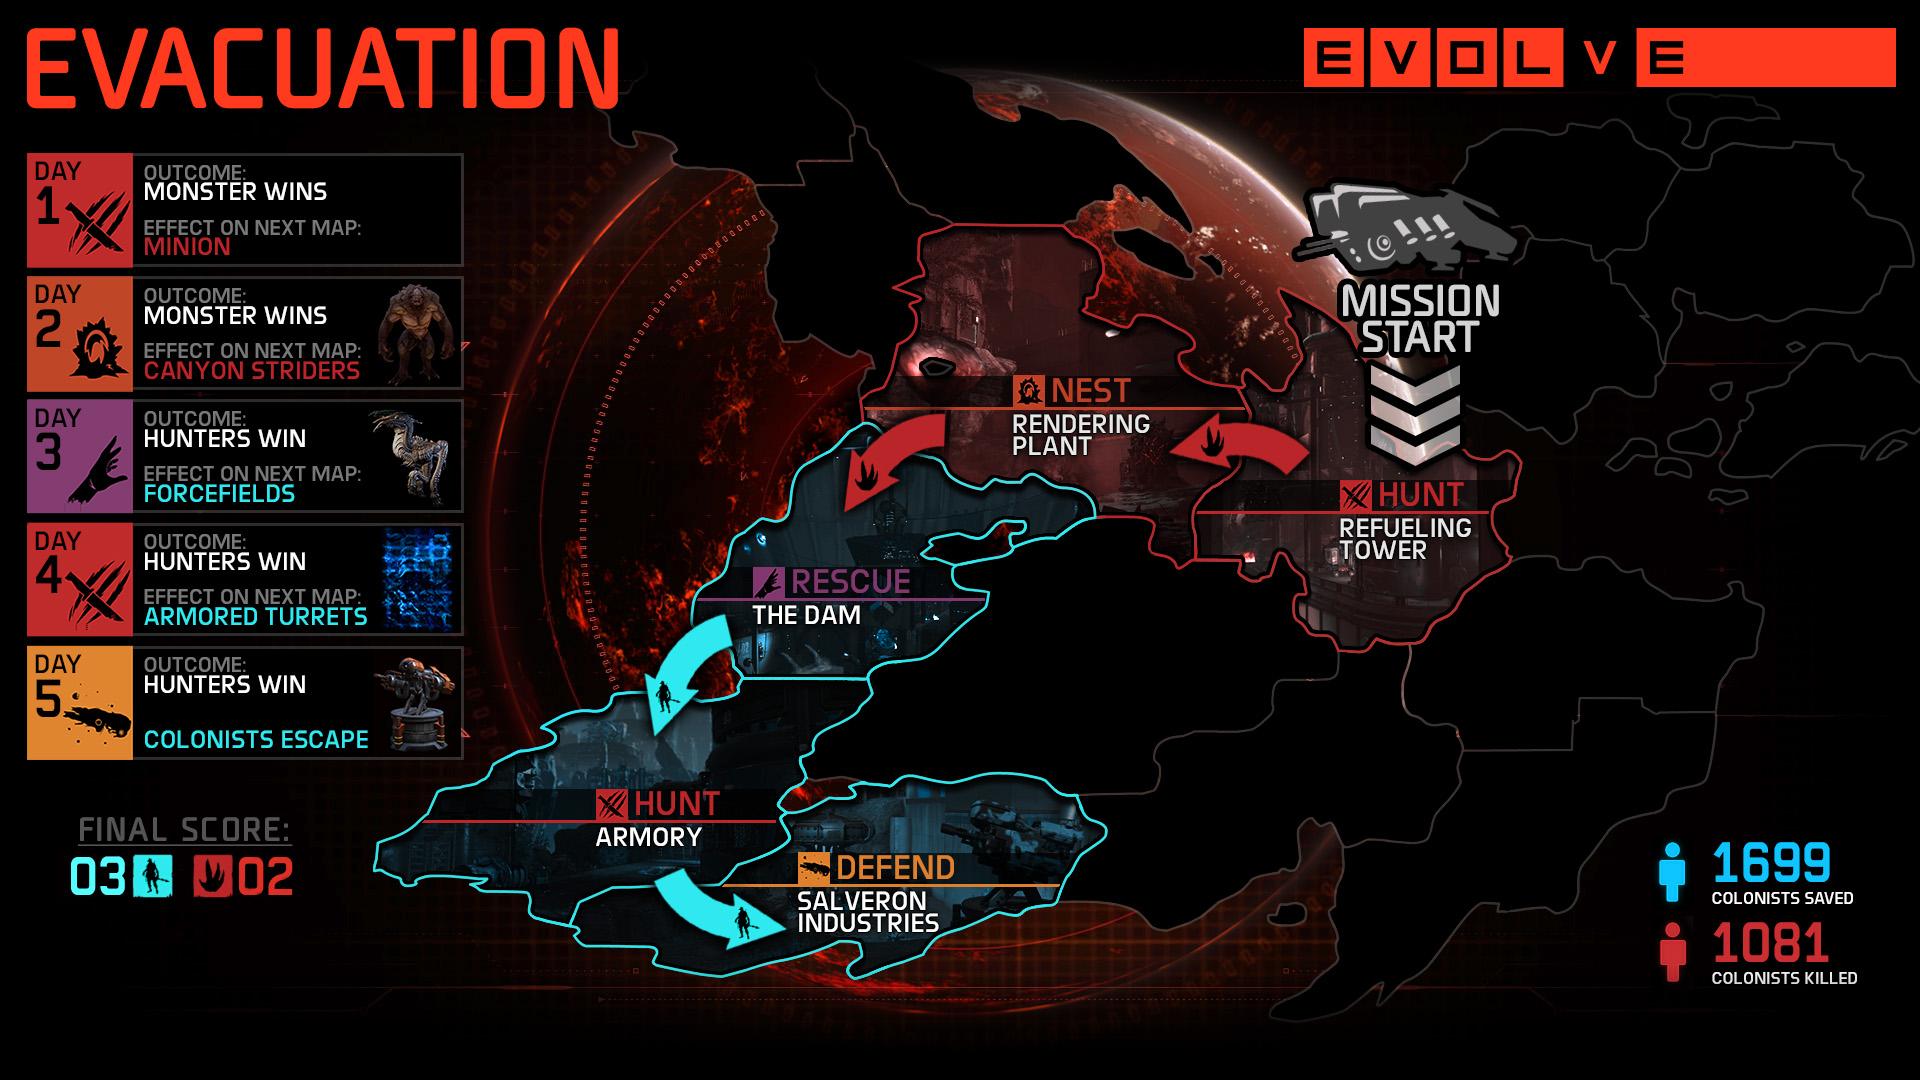 Evolve 3 nouveaux mode Evacuation_2K_Evolve_Evacuation_Infographic